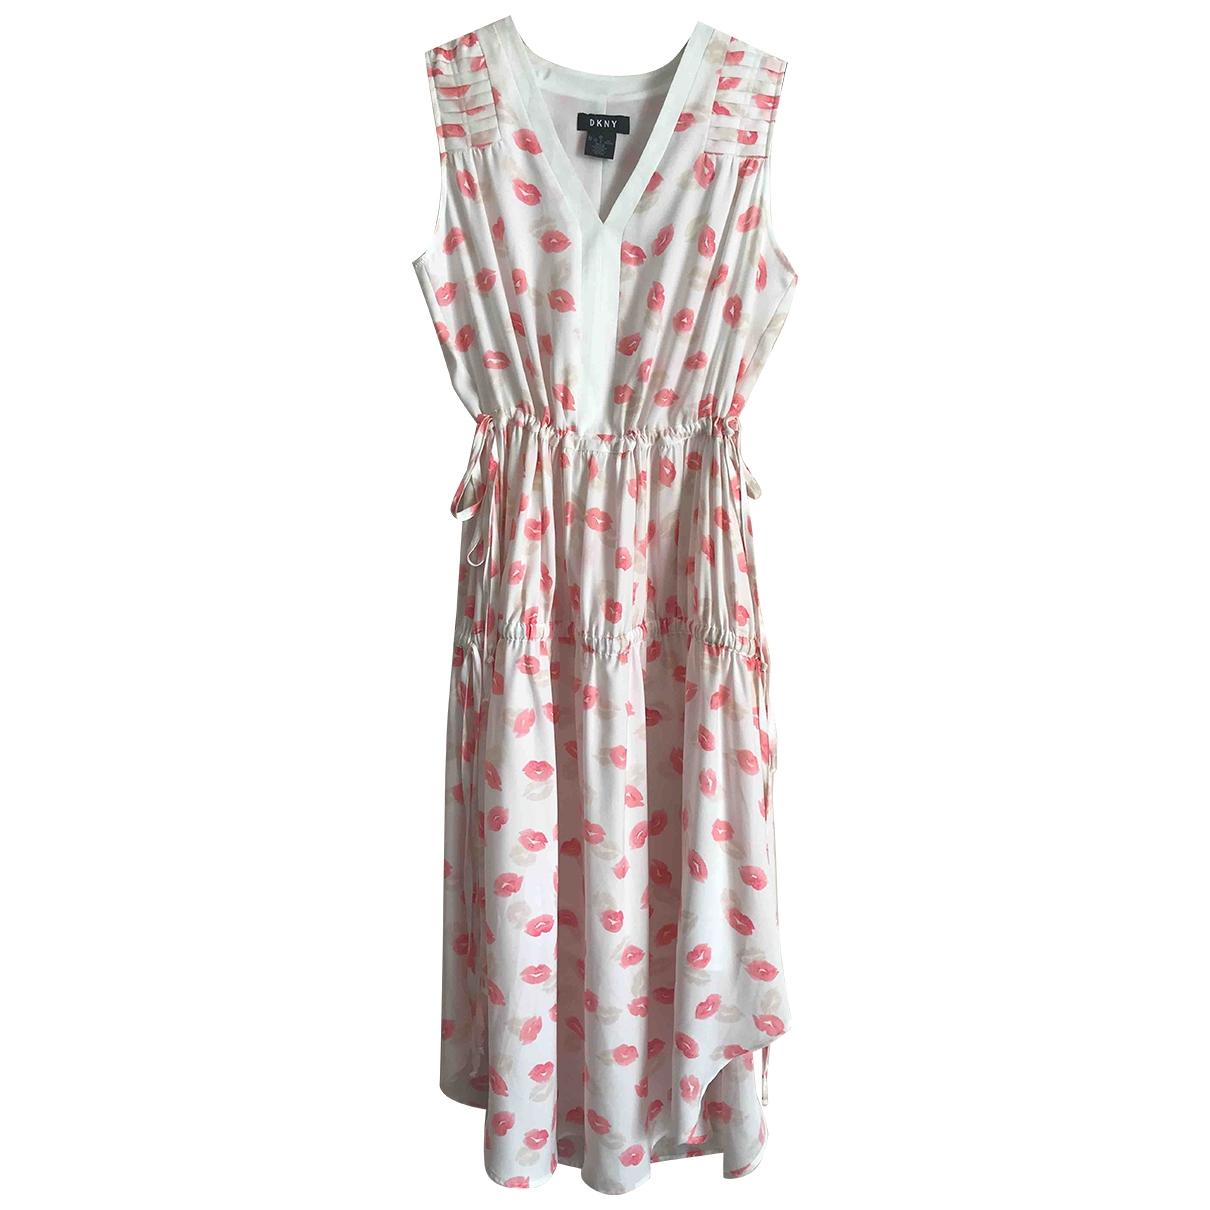 Dkny \N Multicolour dress for Women XS International